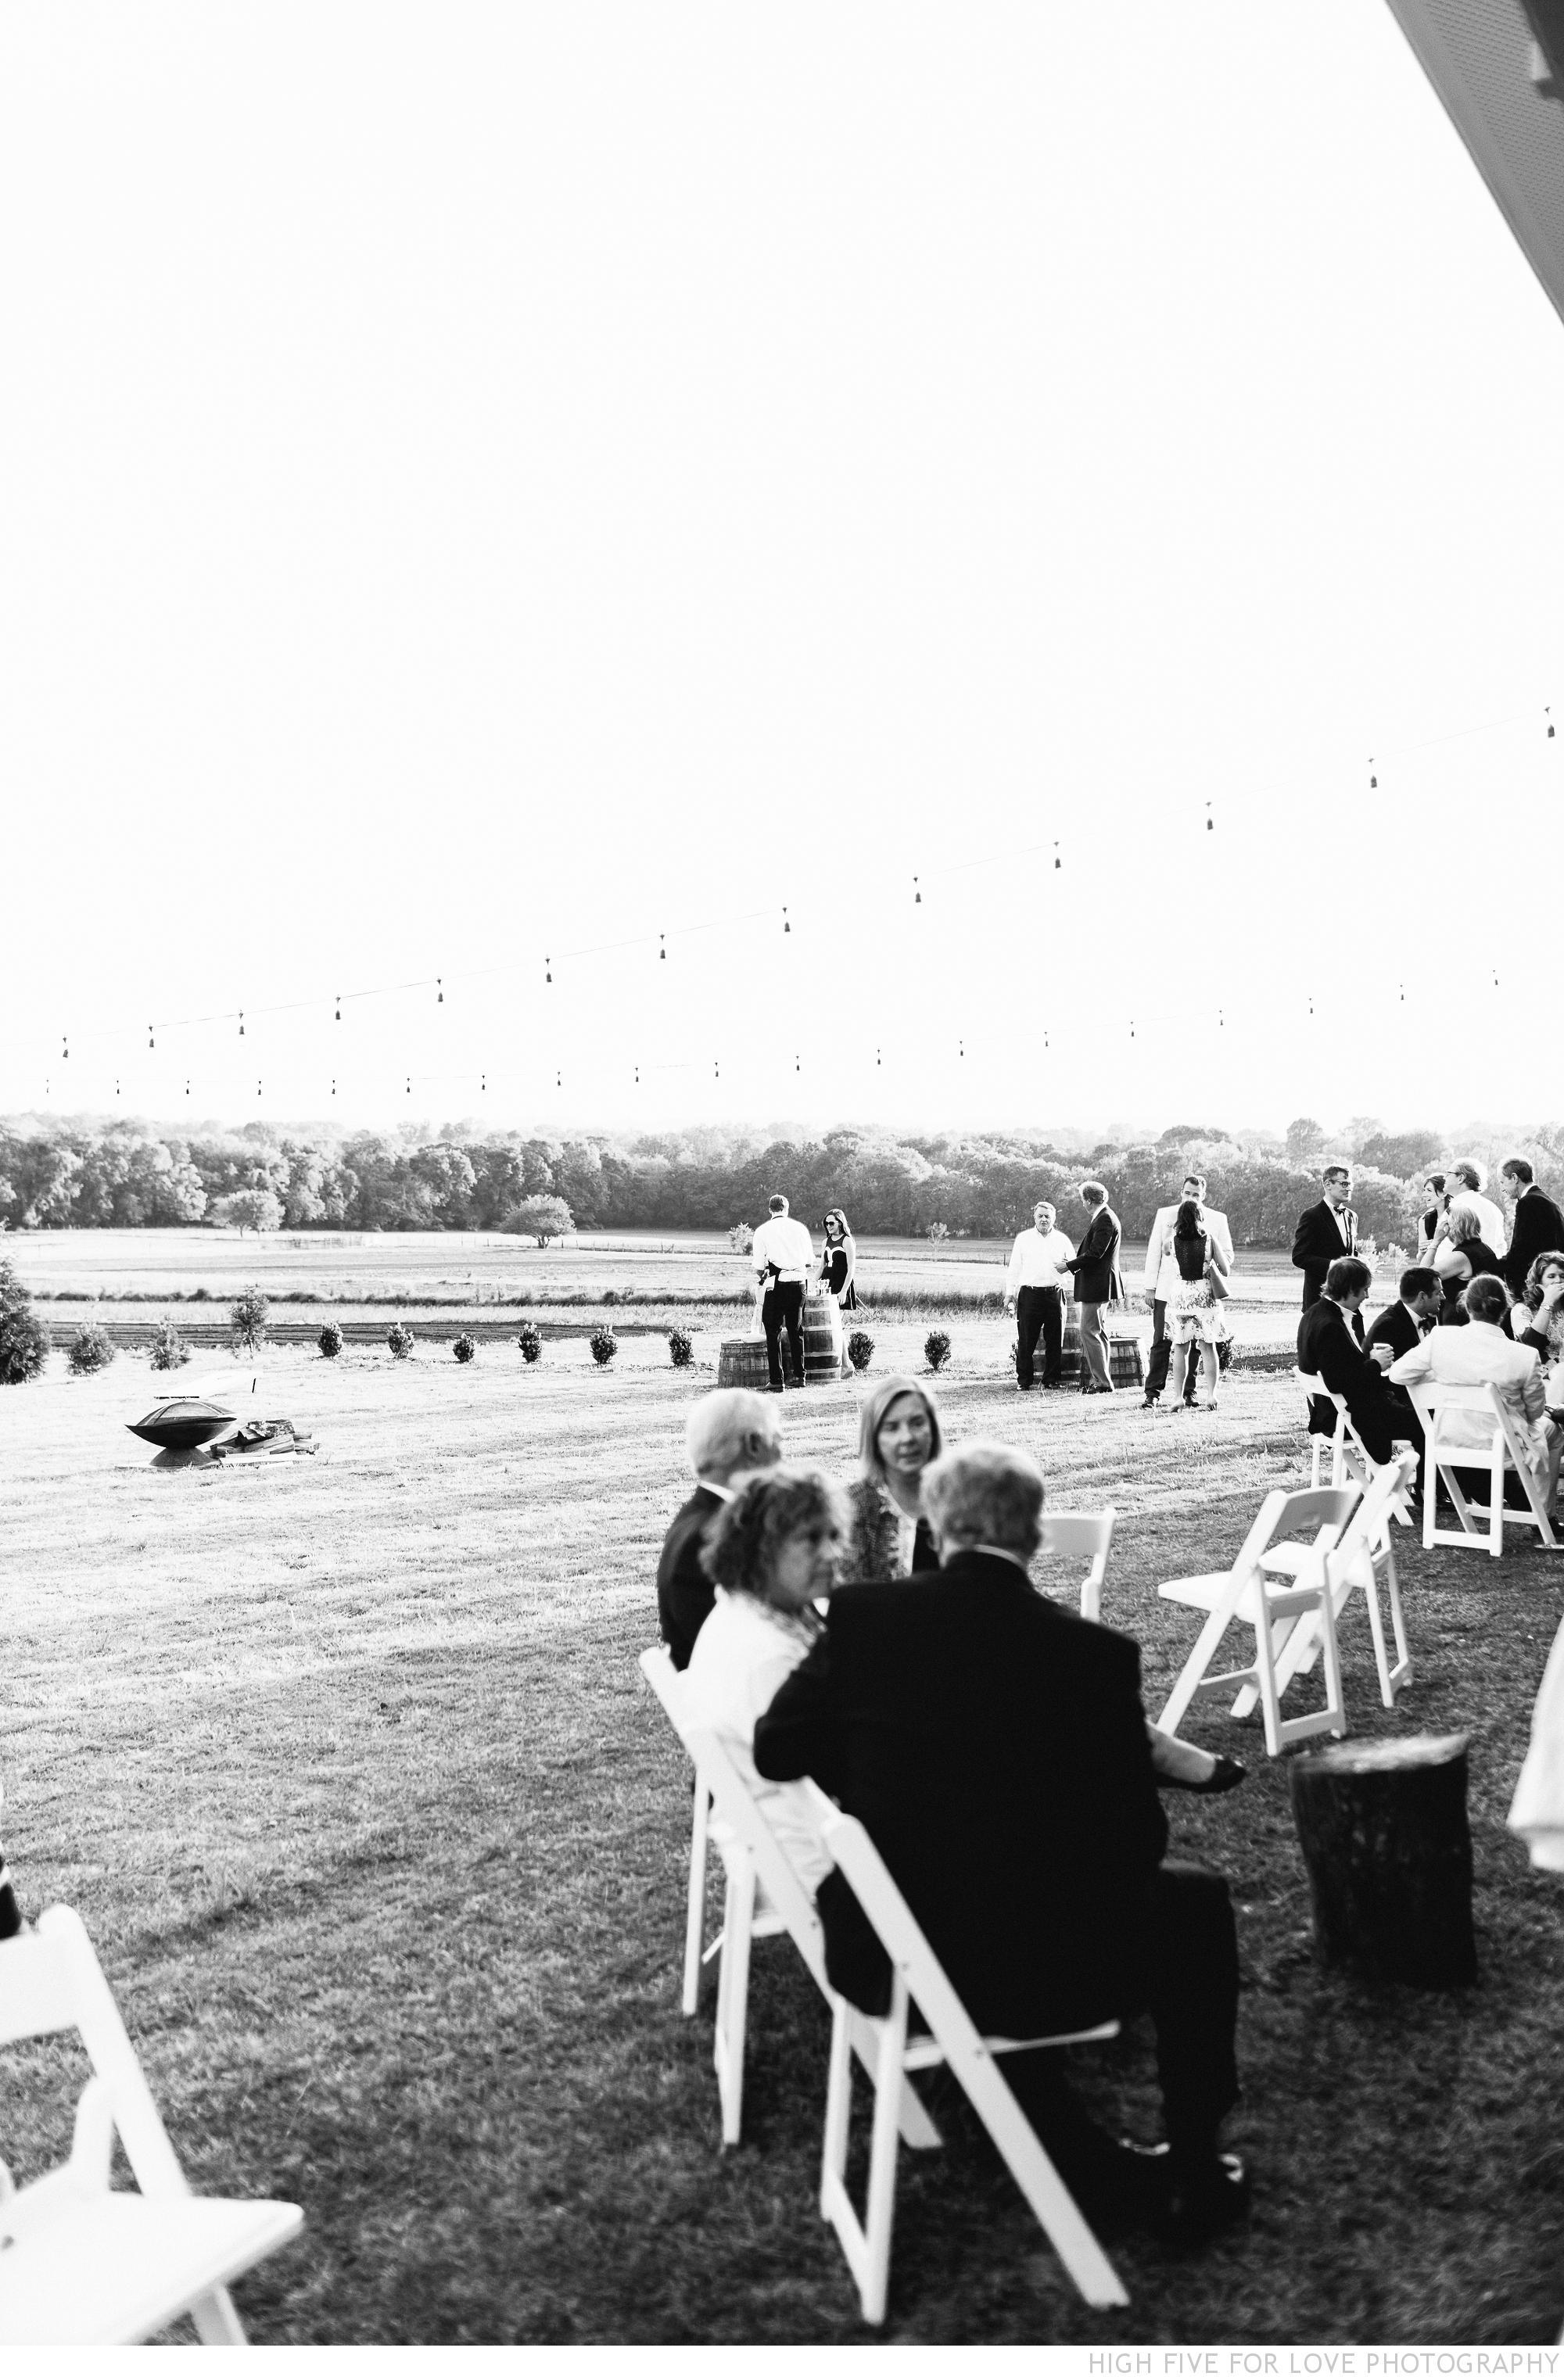 HFFL-Merrick-Freeman-Wedding_0061.jpg